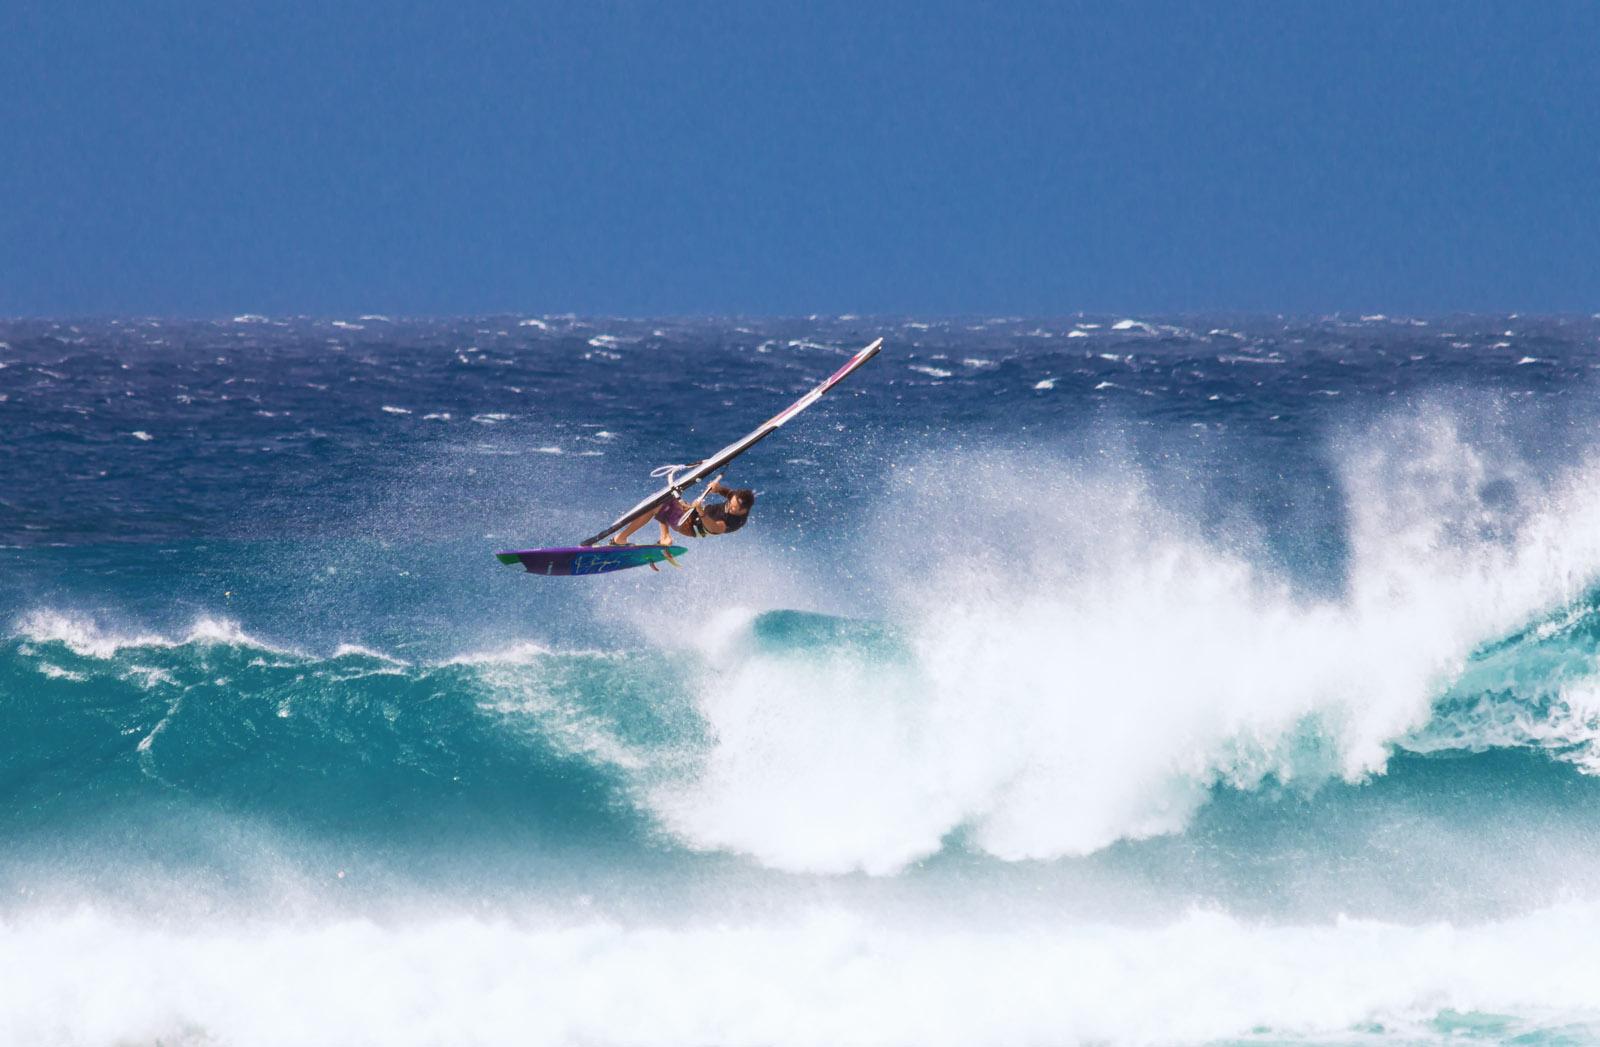 WindsurferAir